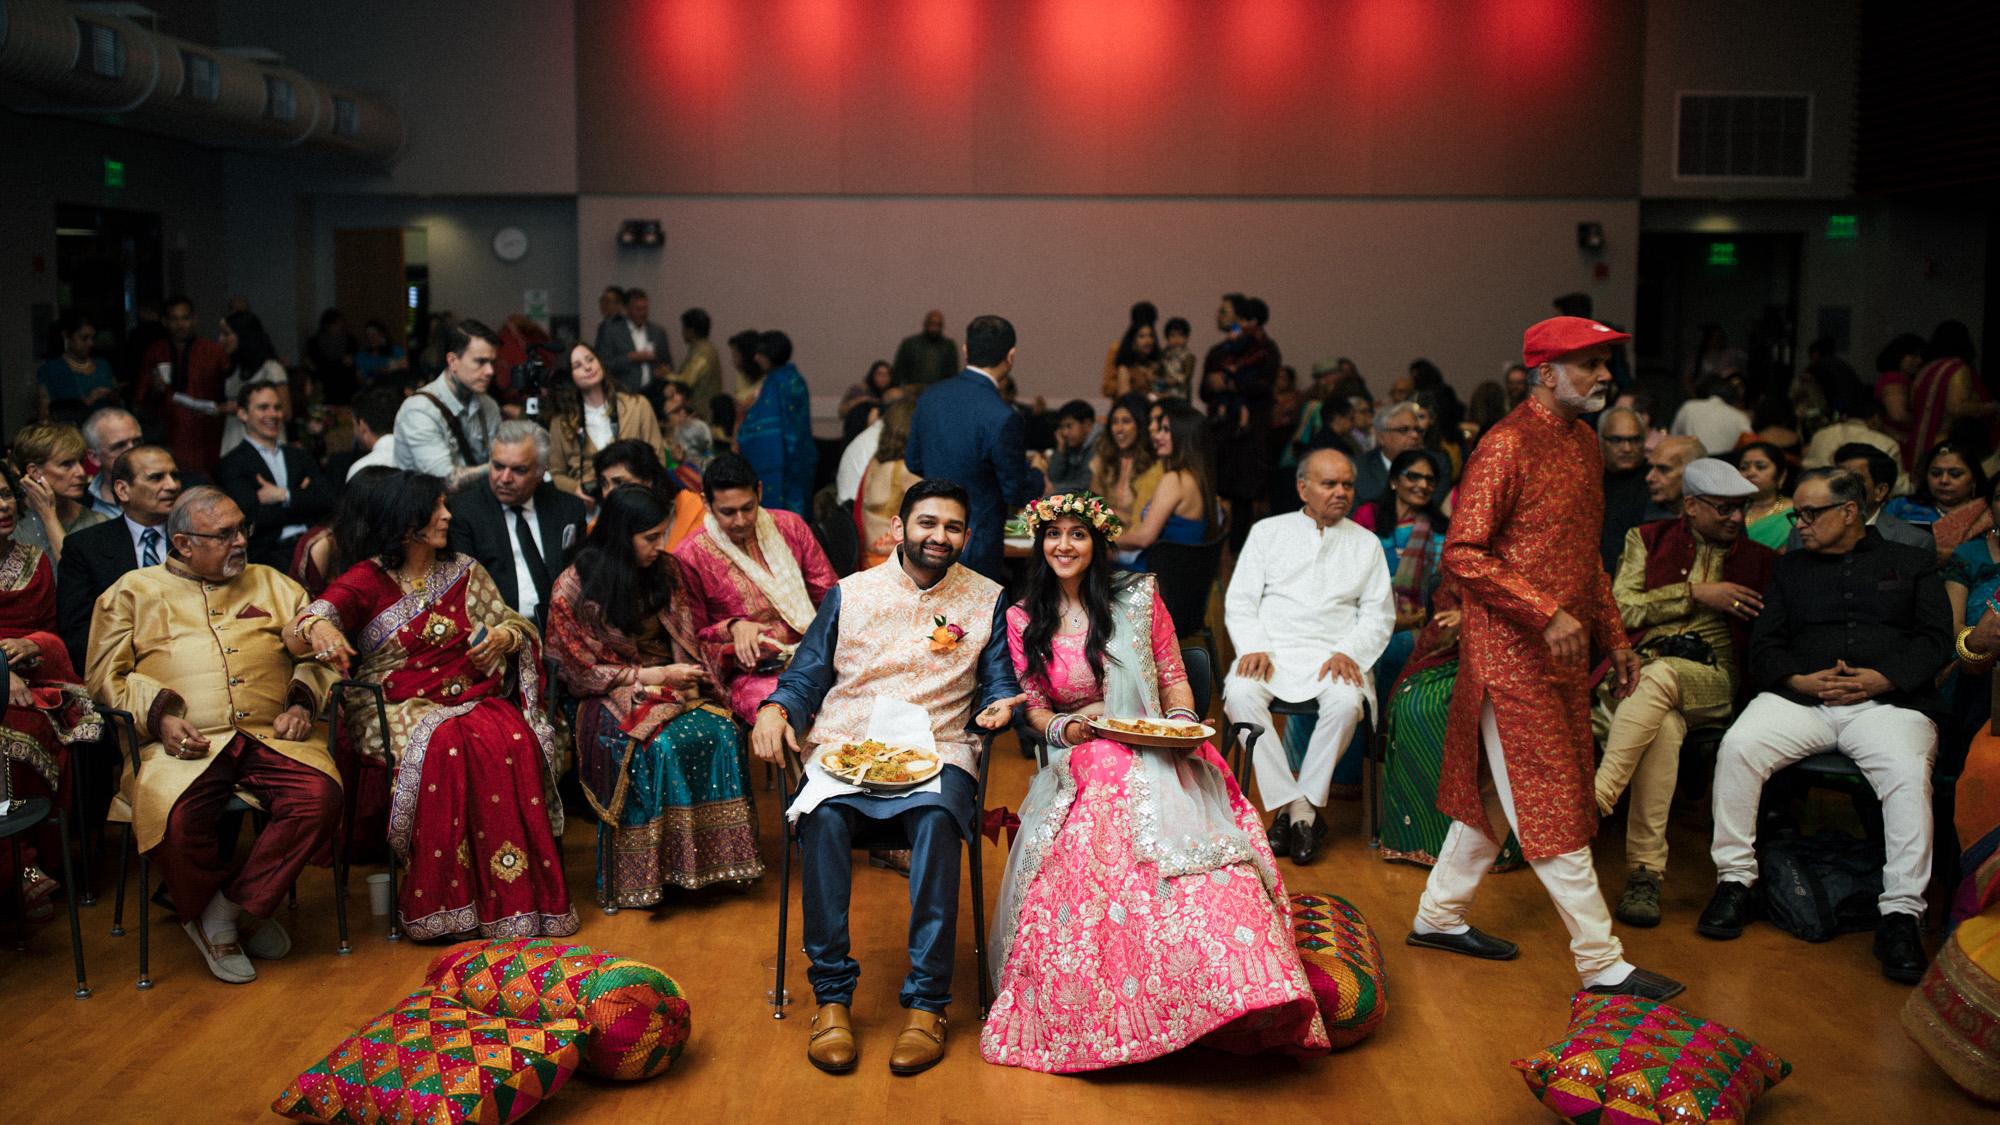 anu_maneesh_alec_vanderboom_Indian_wedding_photography-0032.jpg